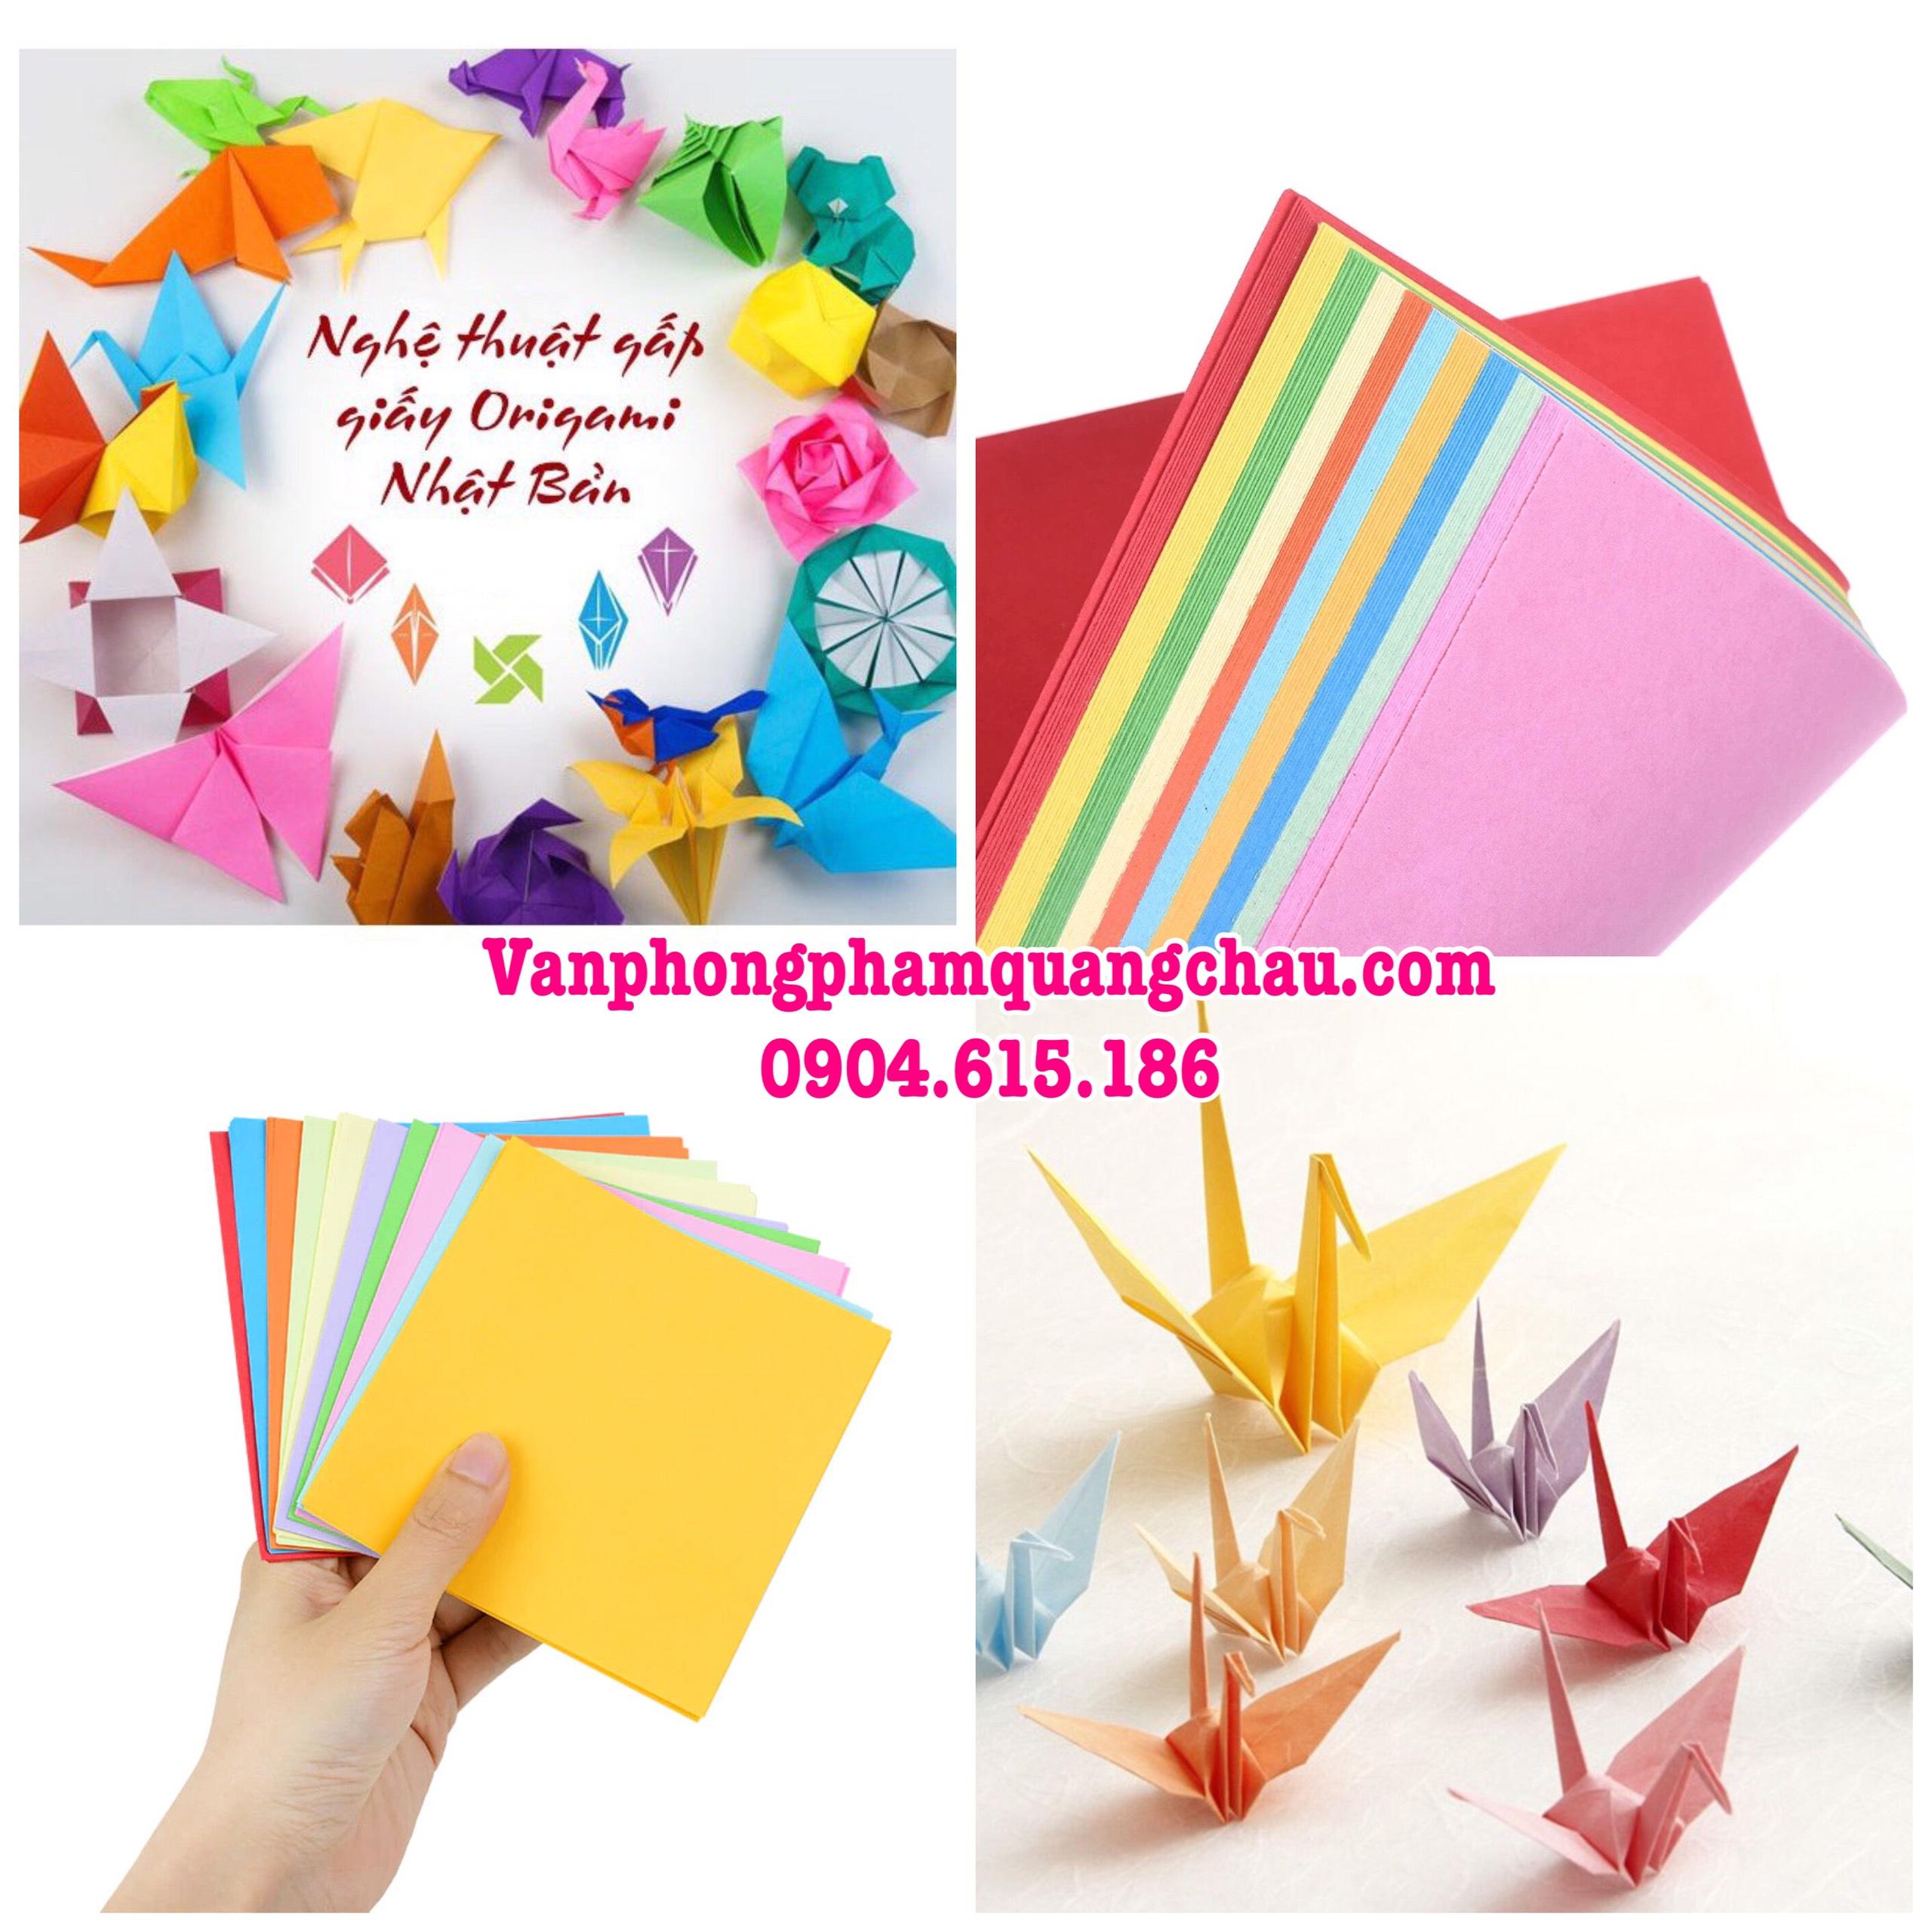 Giấy Origami 2 mặt 1 màu - 100 tờ  (size 14,7cm x 14,7cm)_ORI08